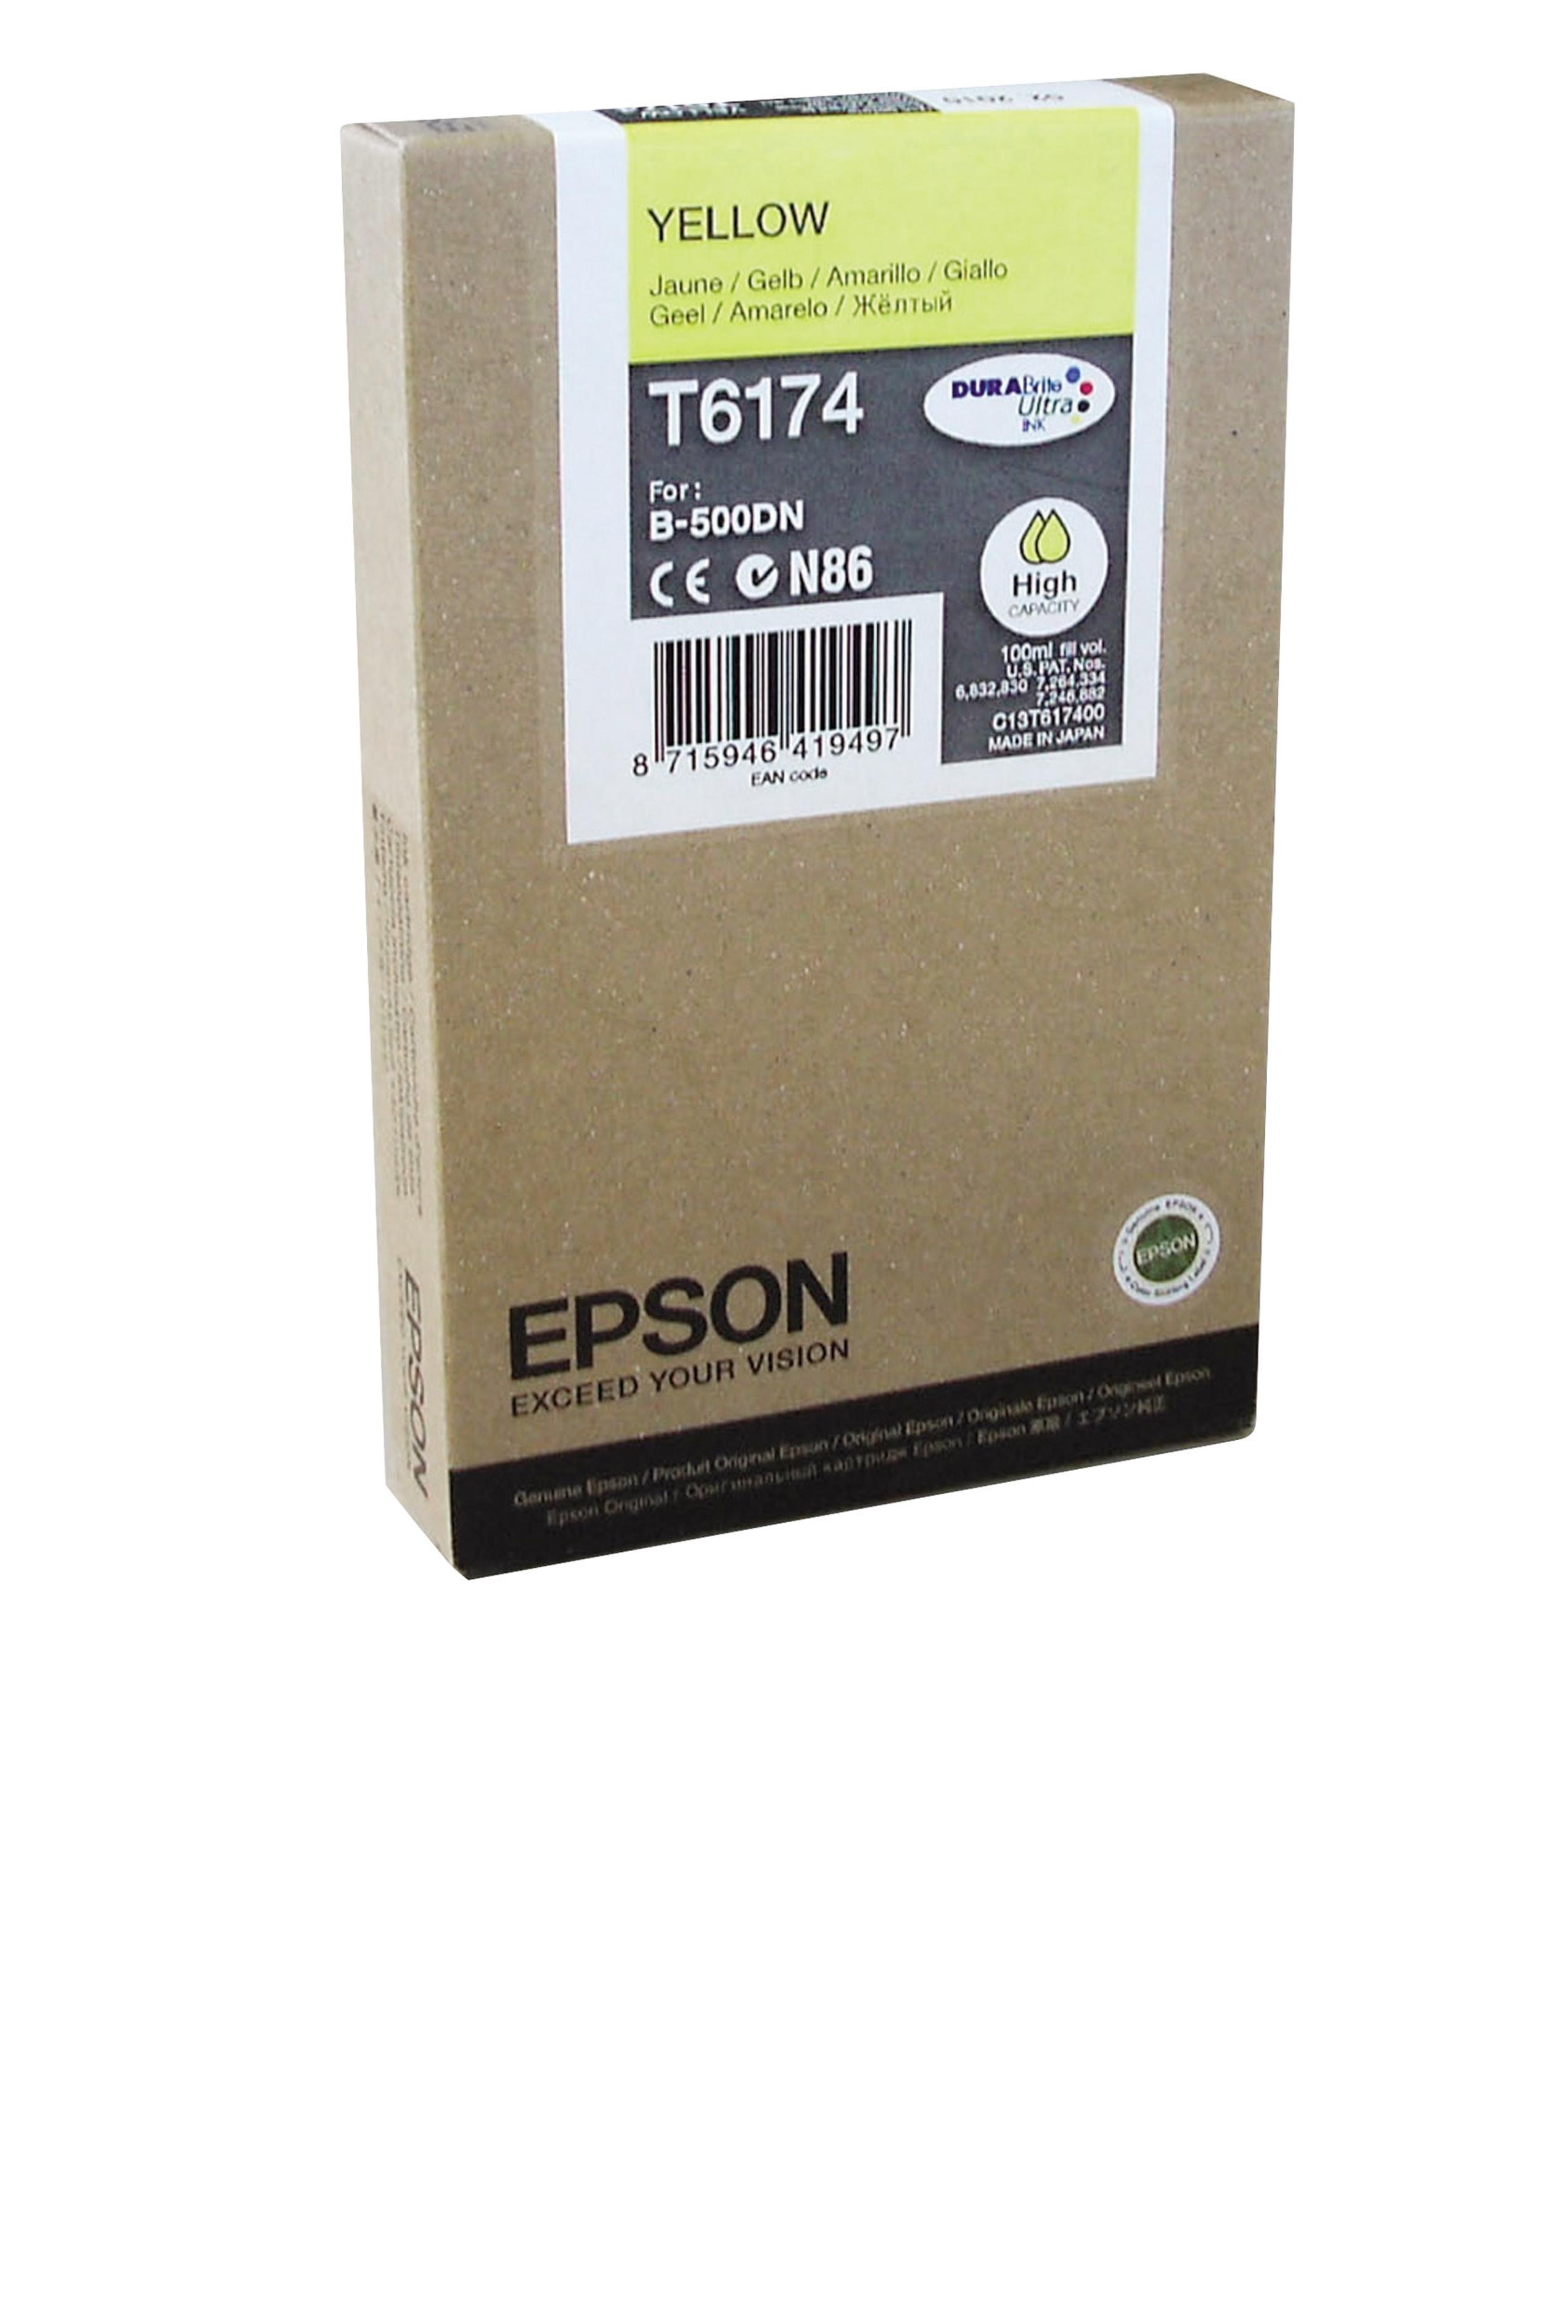 Epson EPSON HI YELLOW INK (7000) (T617400)